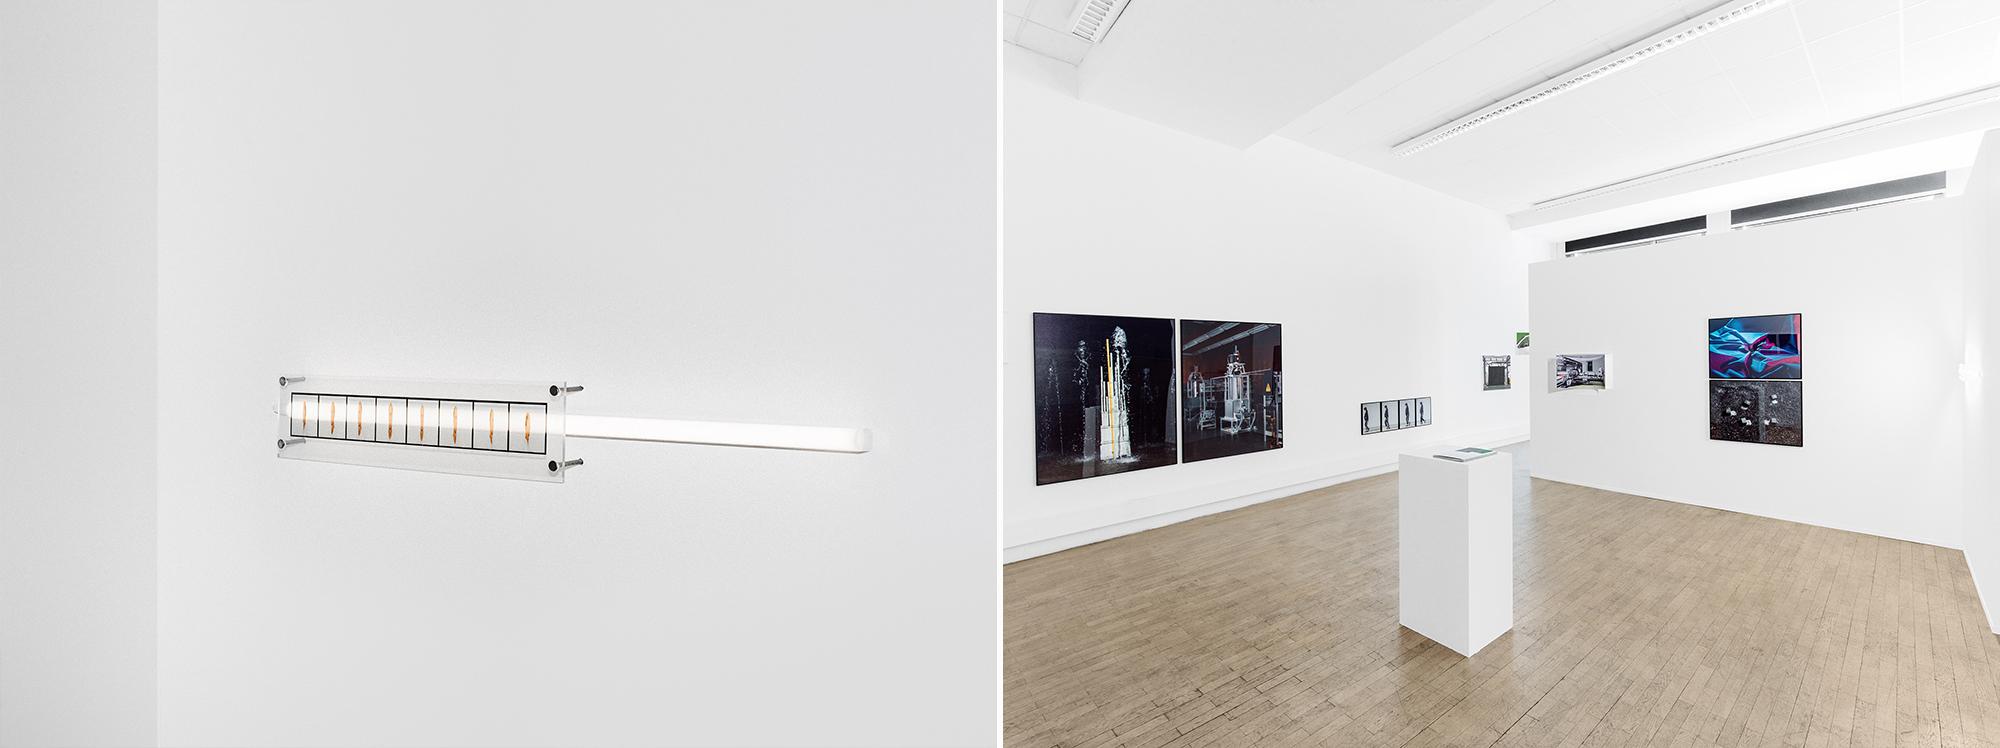 Installationsansicht Werkschau FH Bielefeld SS2018 Lights All Askew In The Heavens Patrick Pollmeier